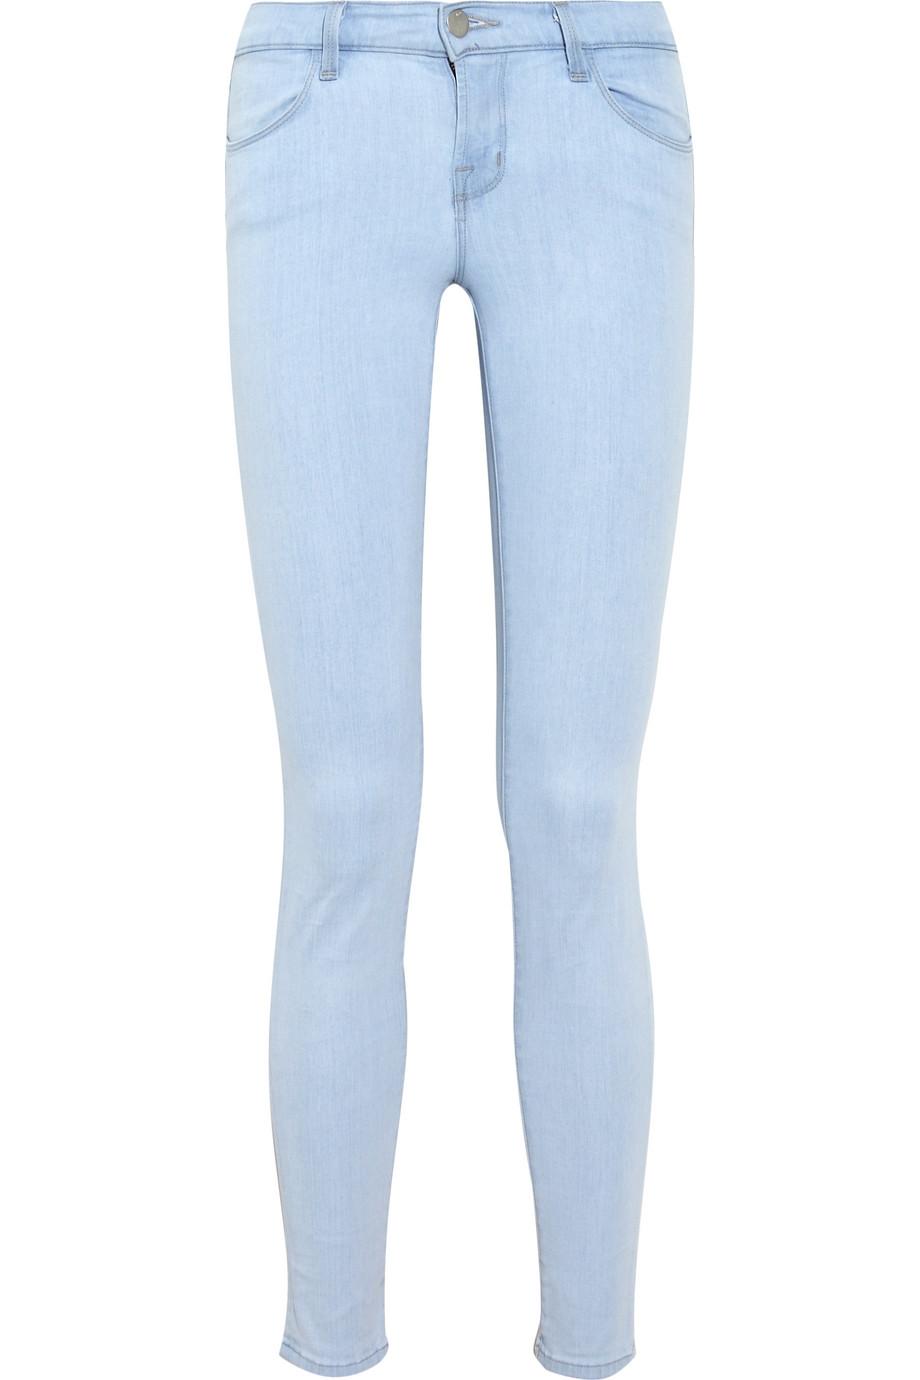 J Brand Lowrise Skinny Jeans in Denim (Blue)